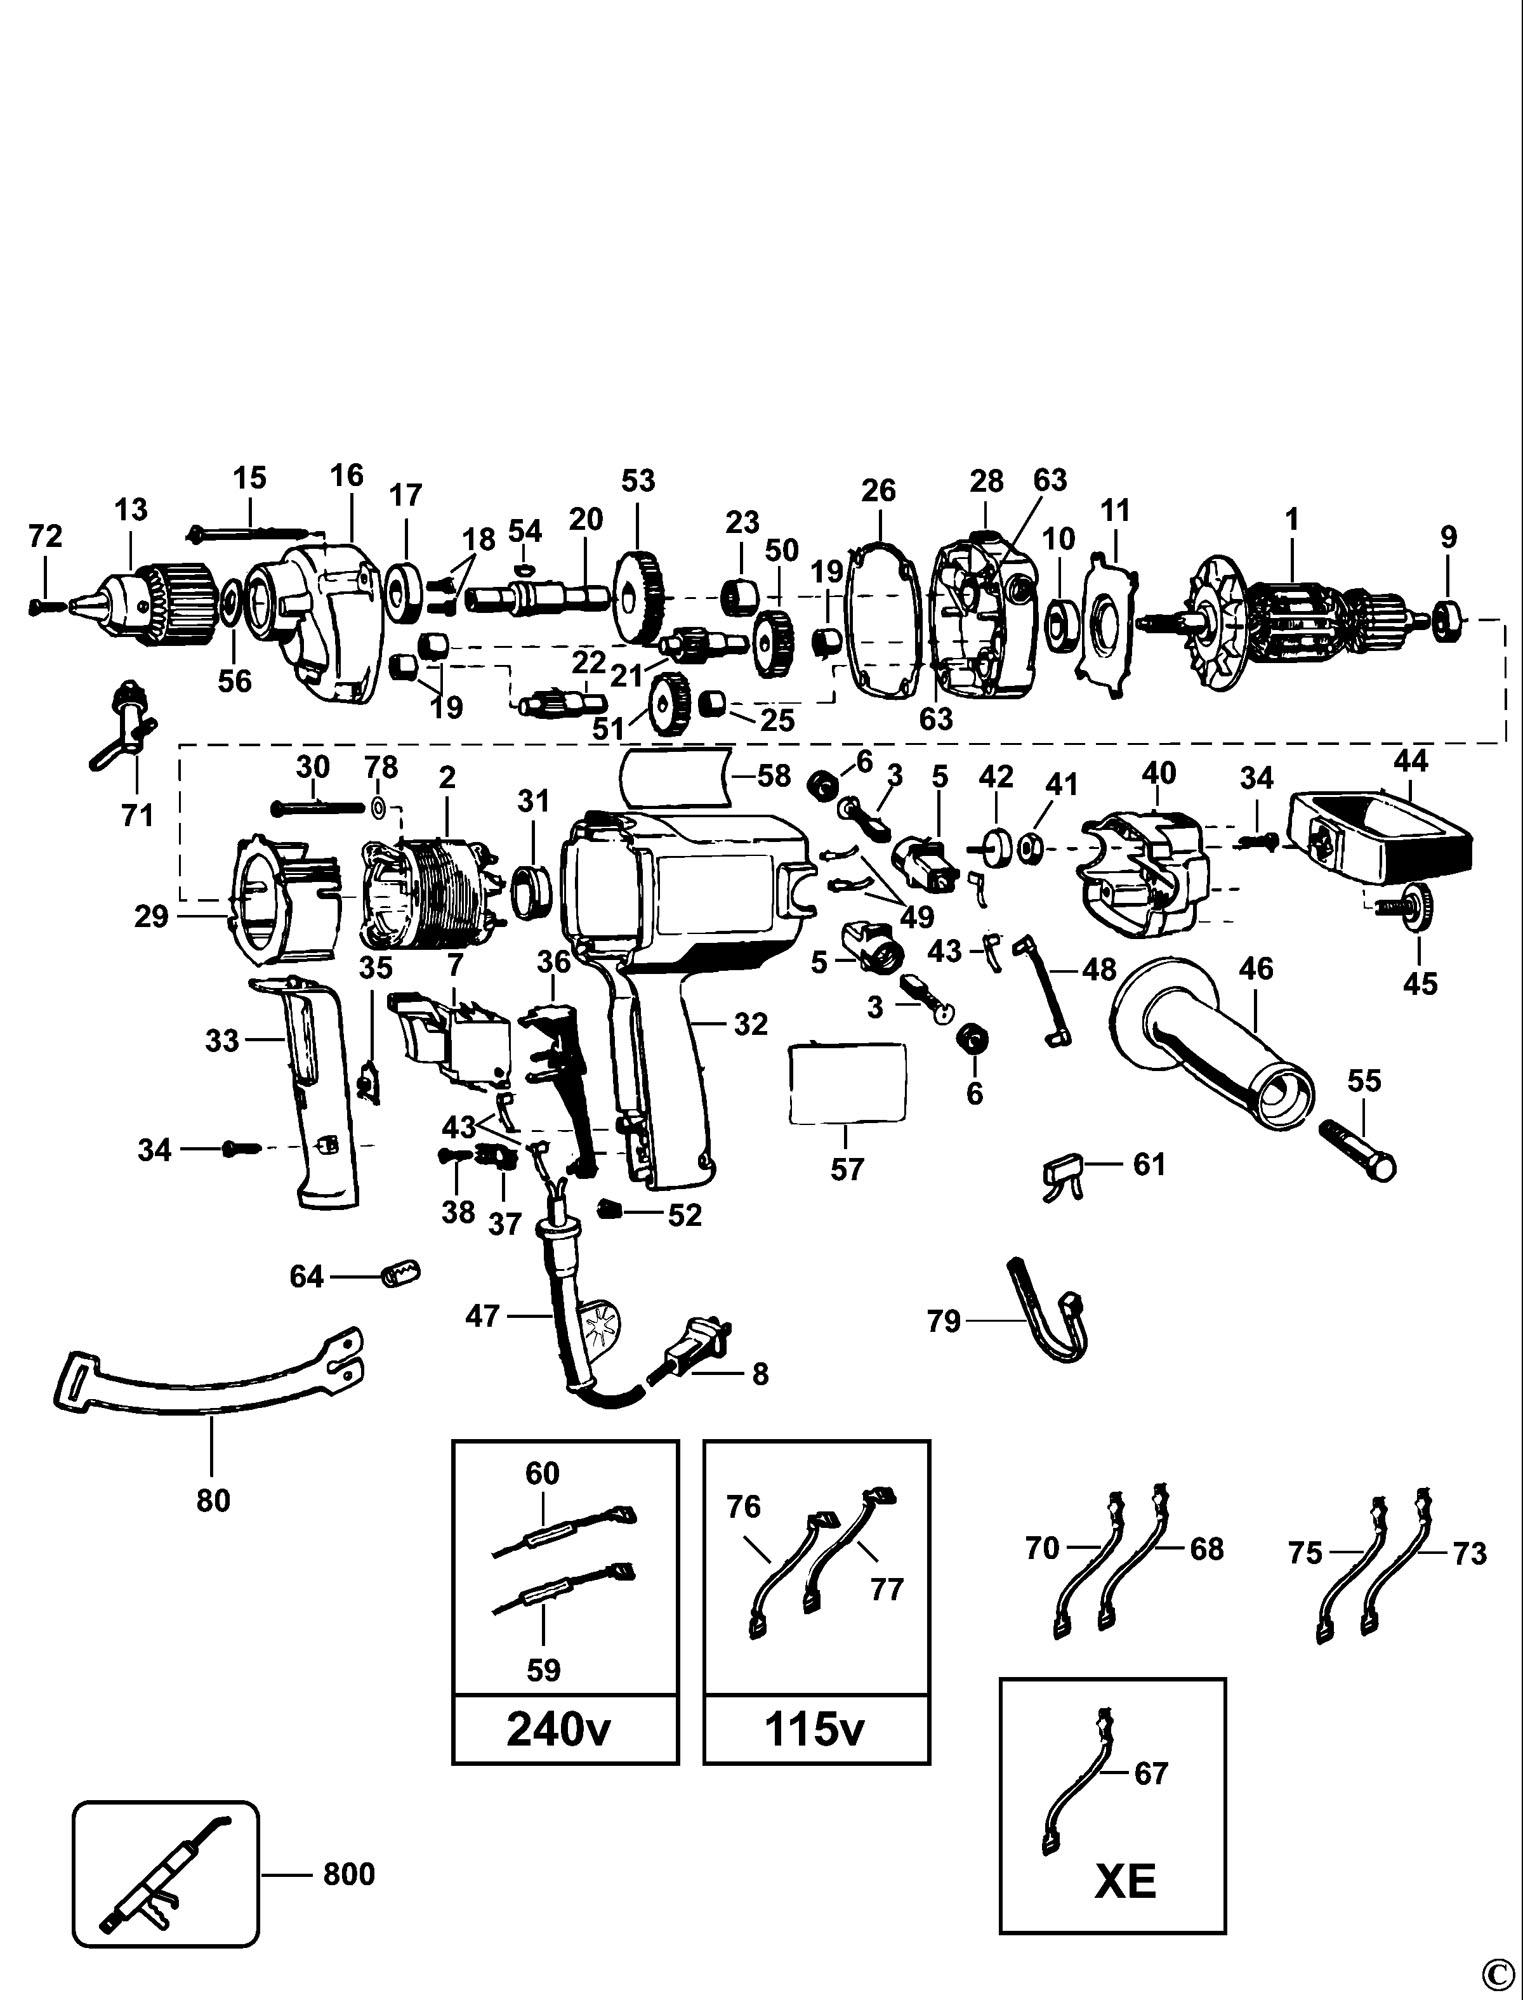 Spares for Dewalt Dw130 Mixer (type 2) SPARE_DW130/TYPE_2